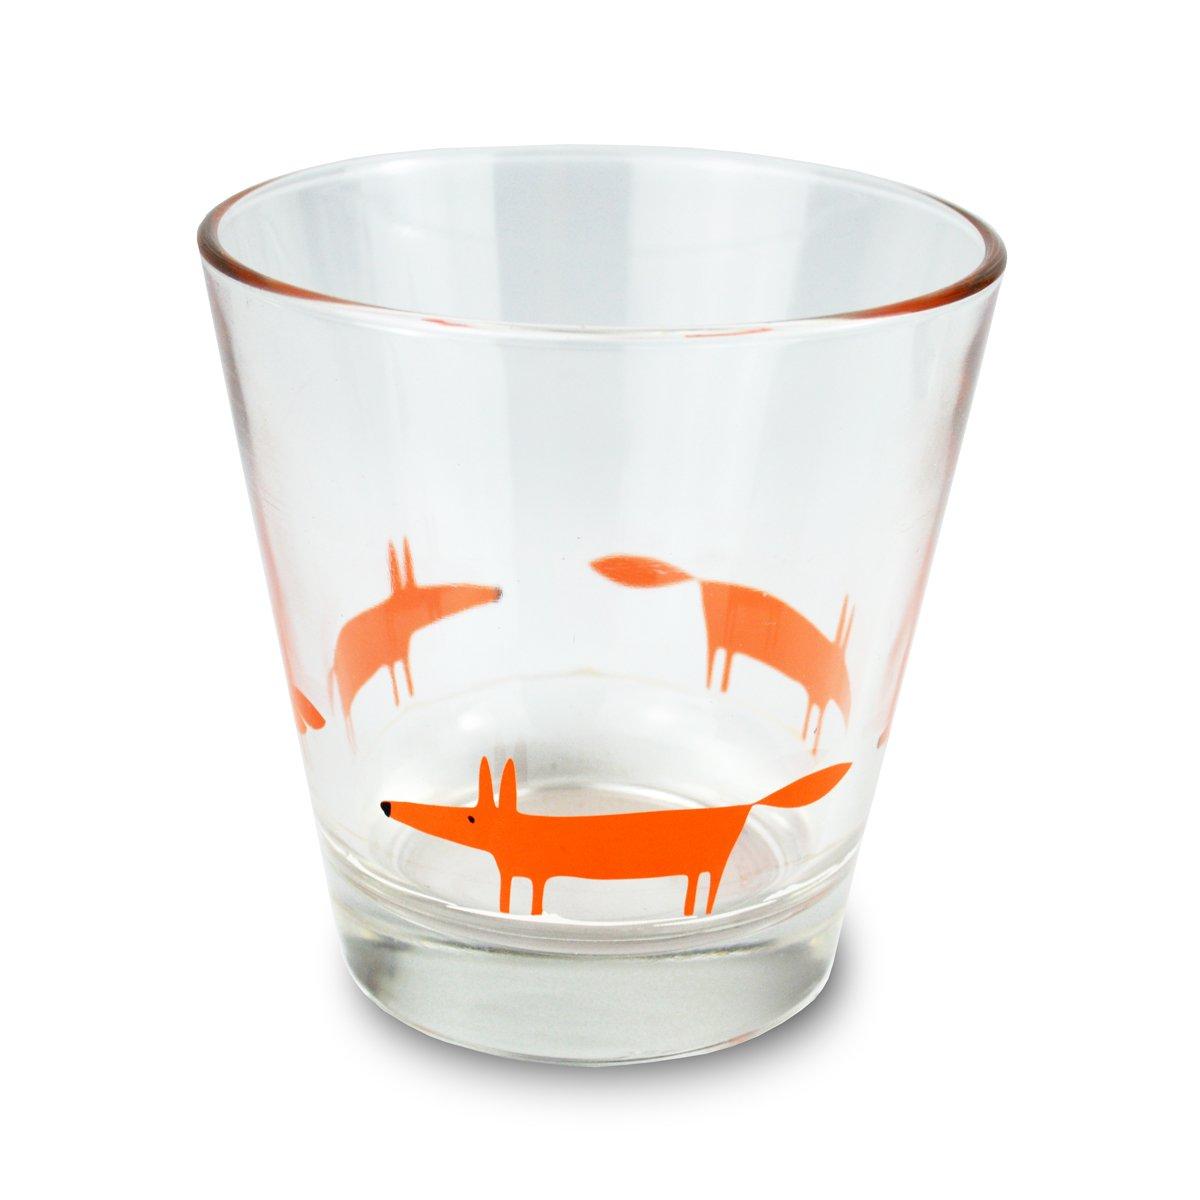 Scion - Bicchiere in Vetro Mr Fox MAKE International SC-0047